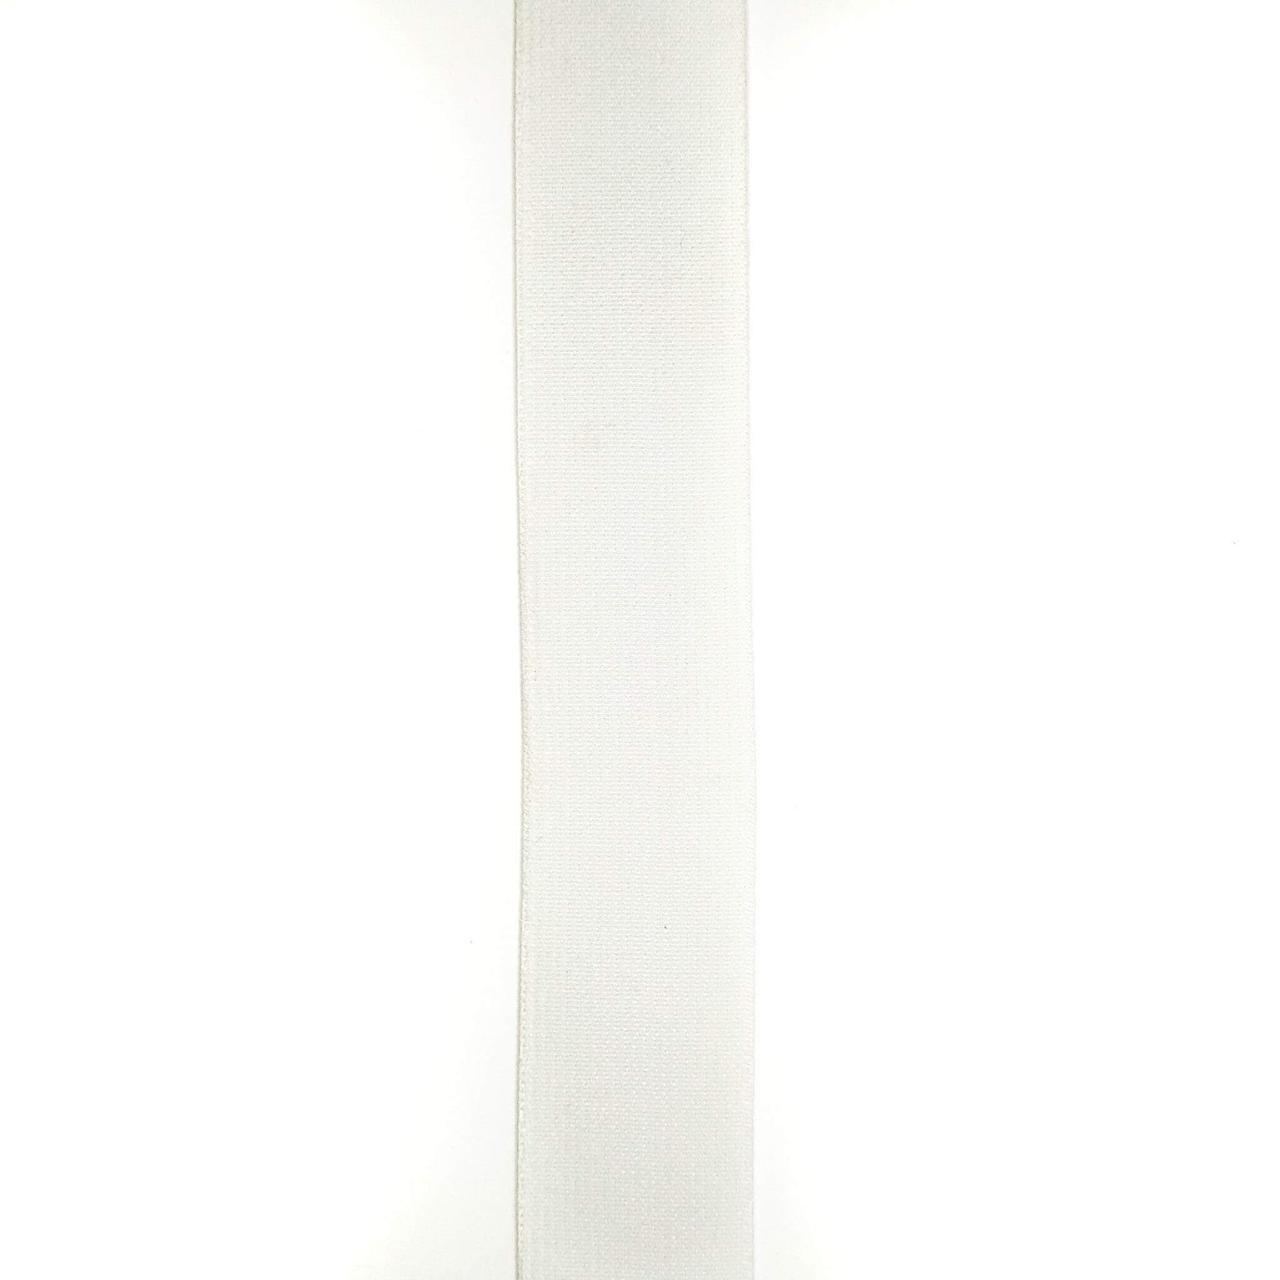 Стрічка еластична 30 мм (50м/рулон)